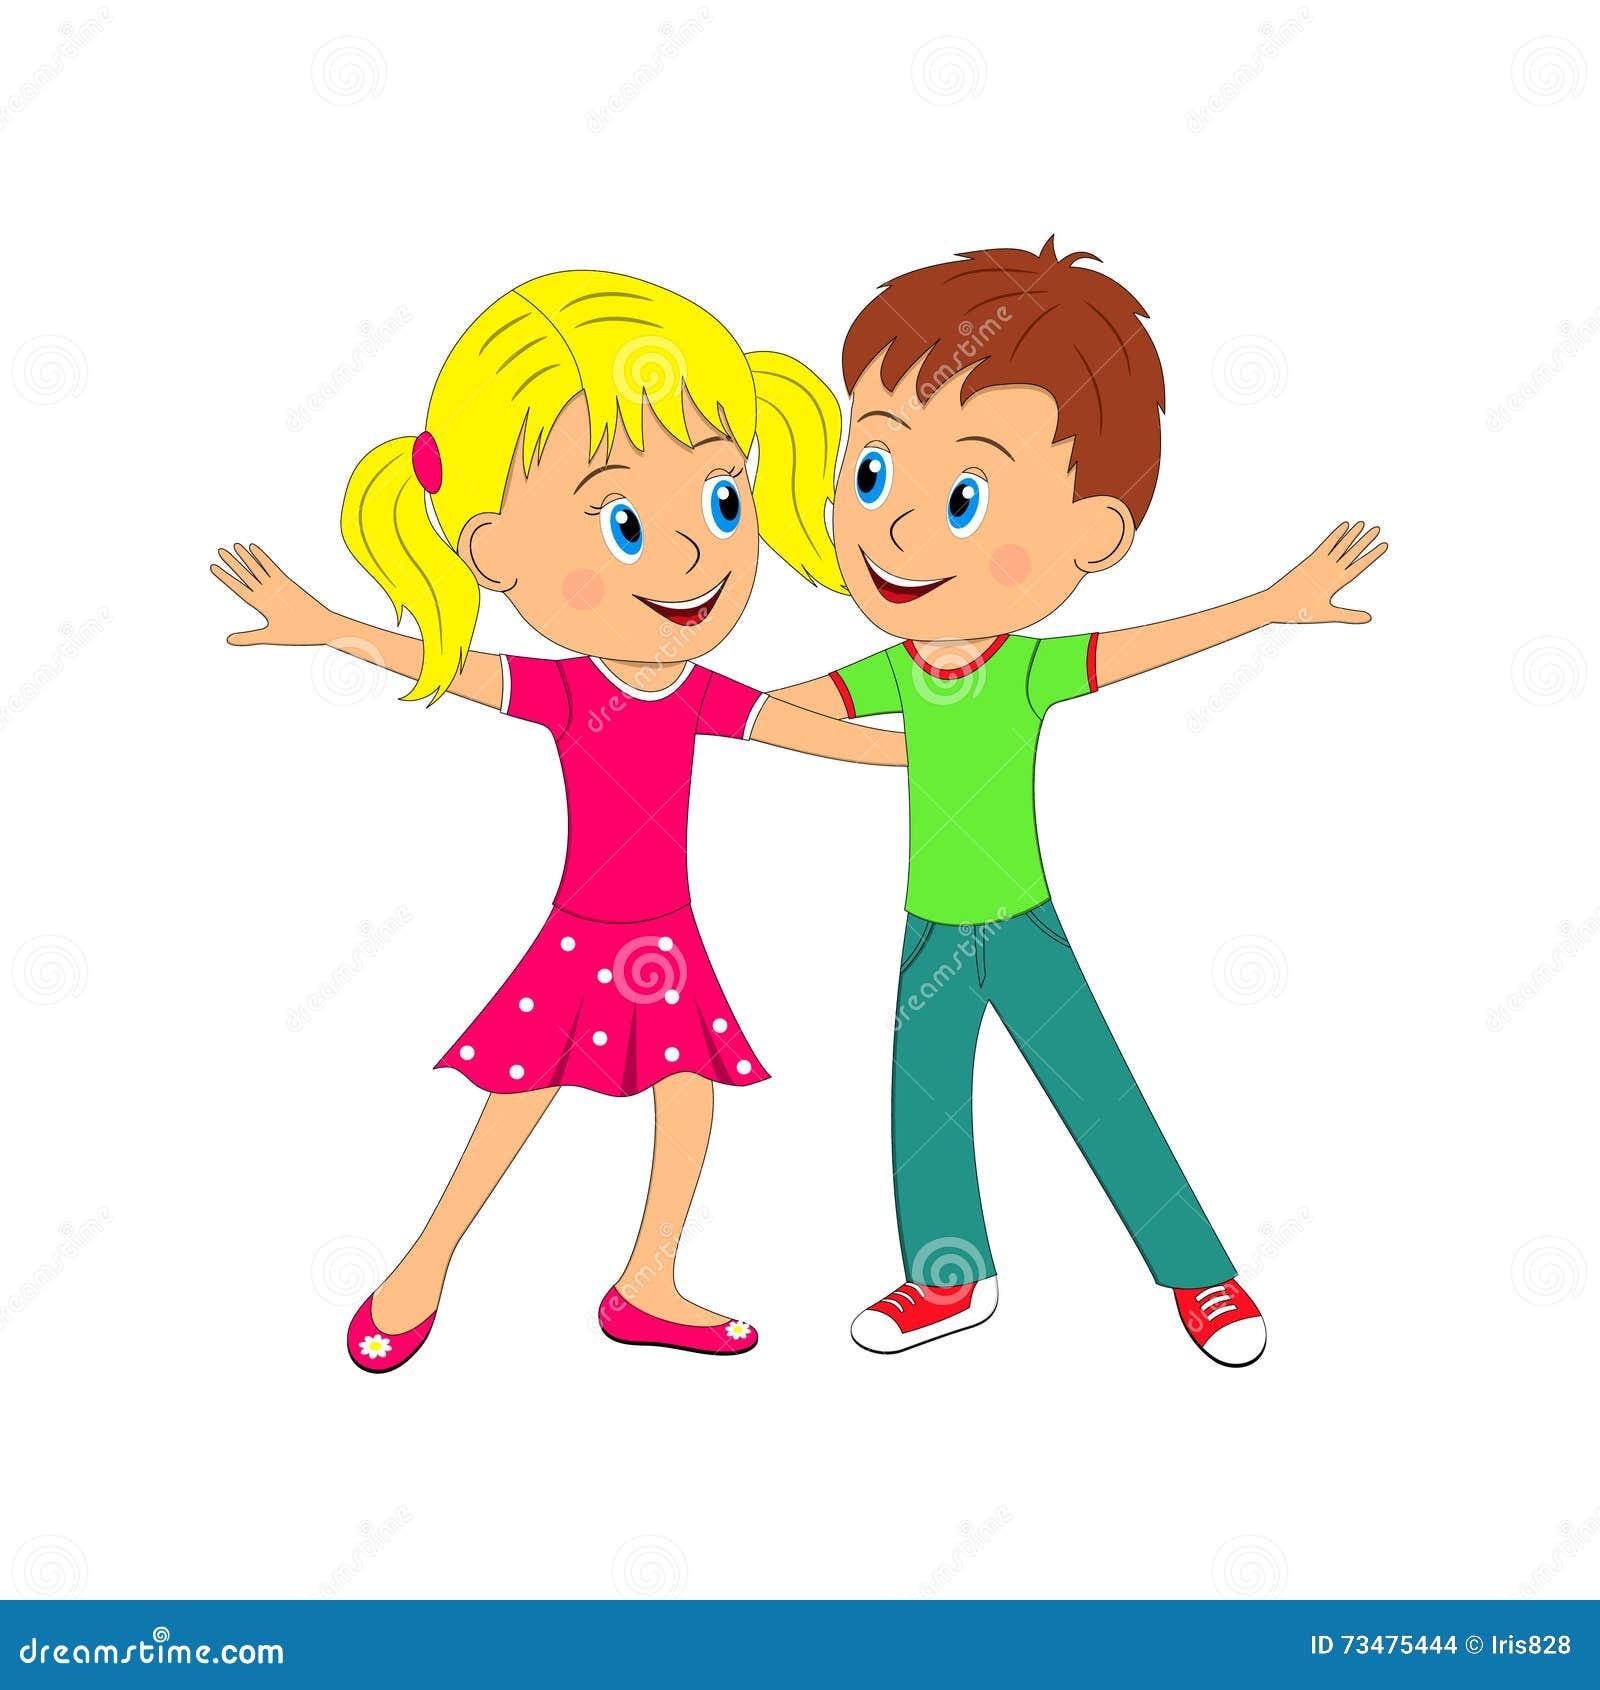 Boy and girl dancing